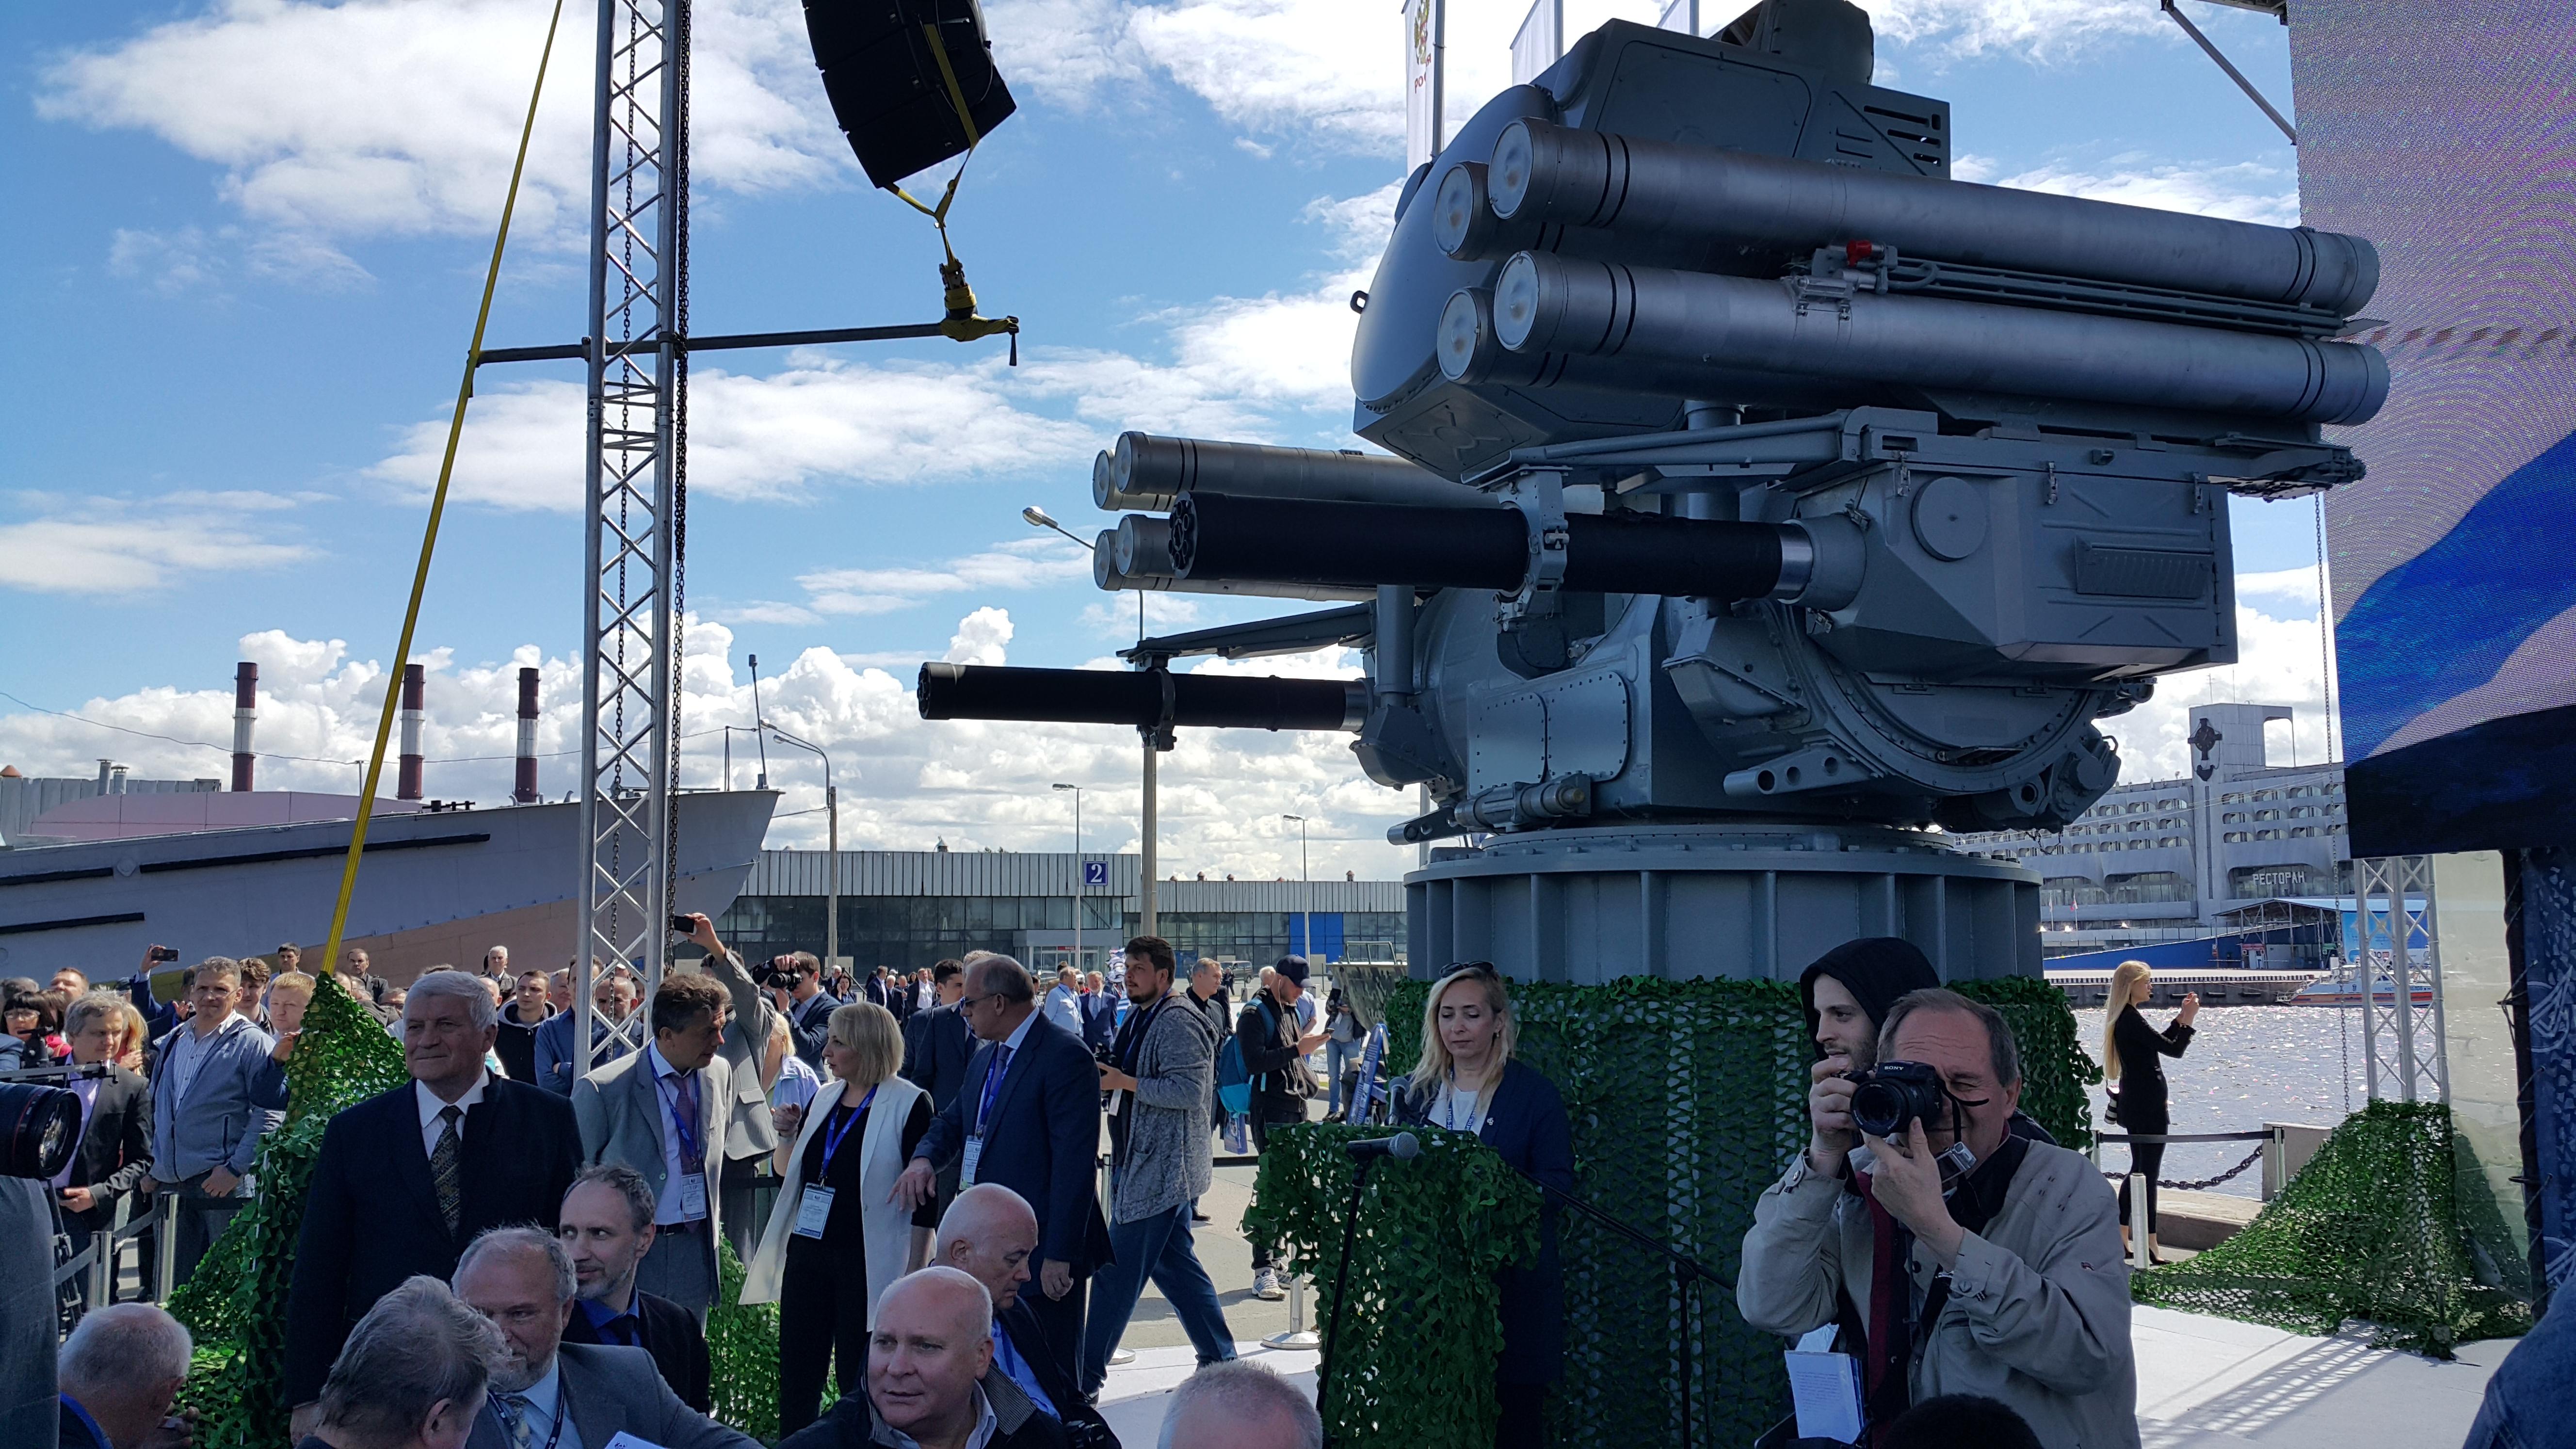 IMDS 2017 - St. Petersburg 4411431_original